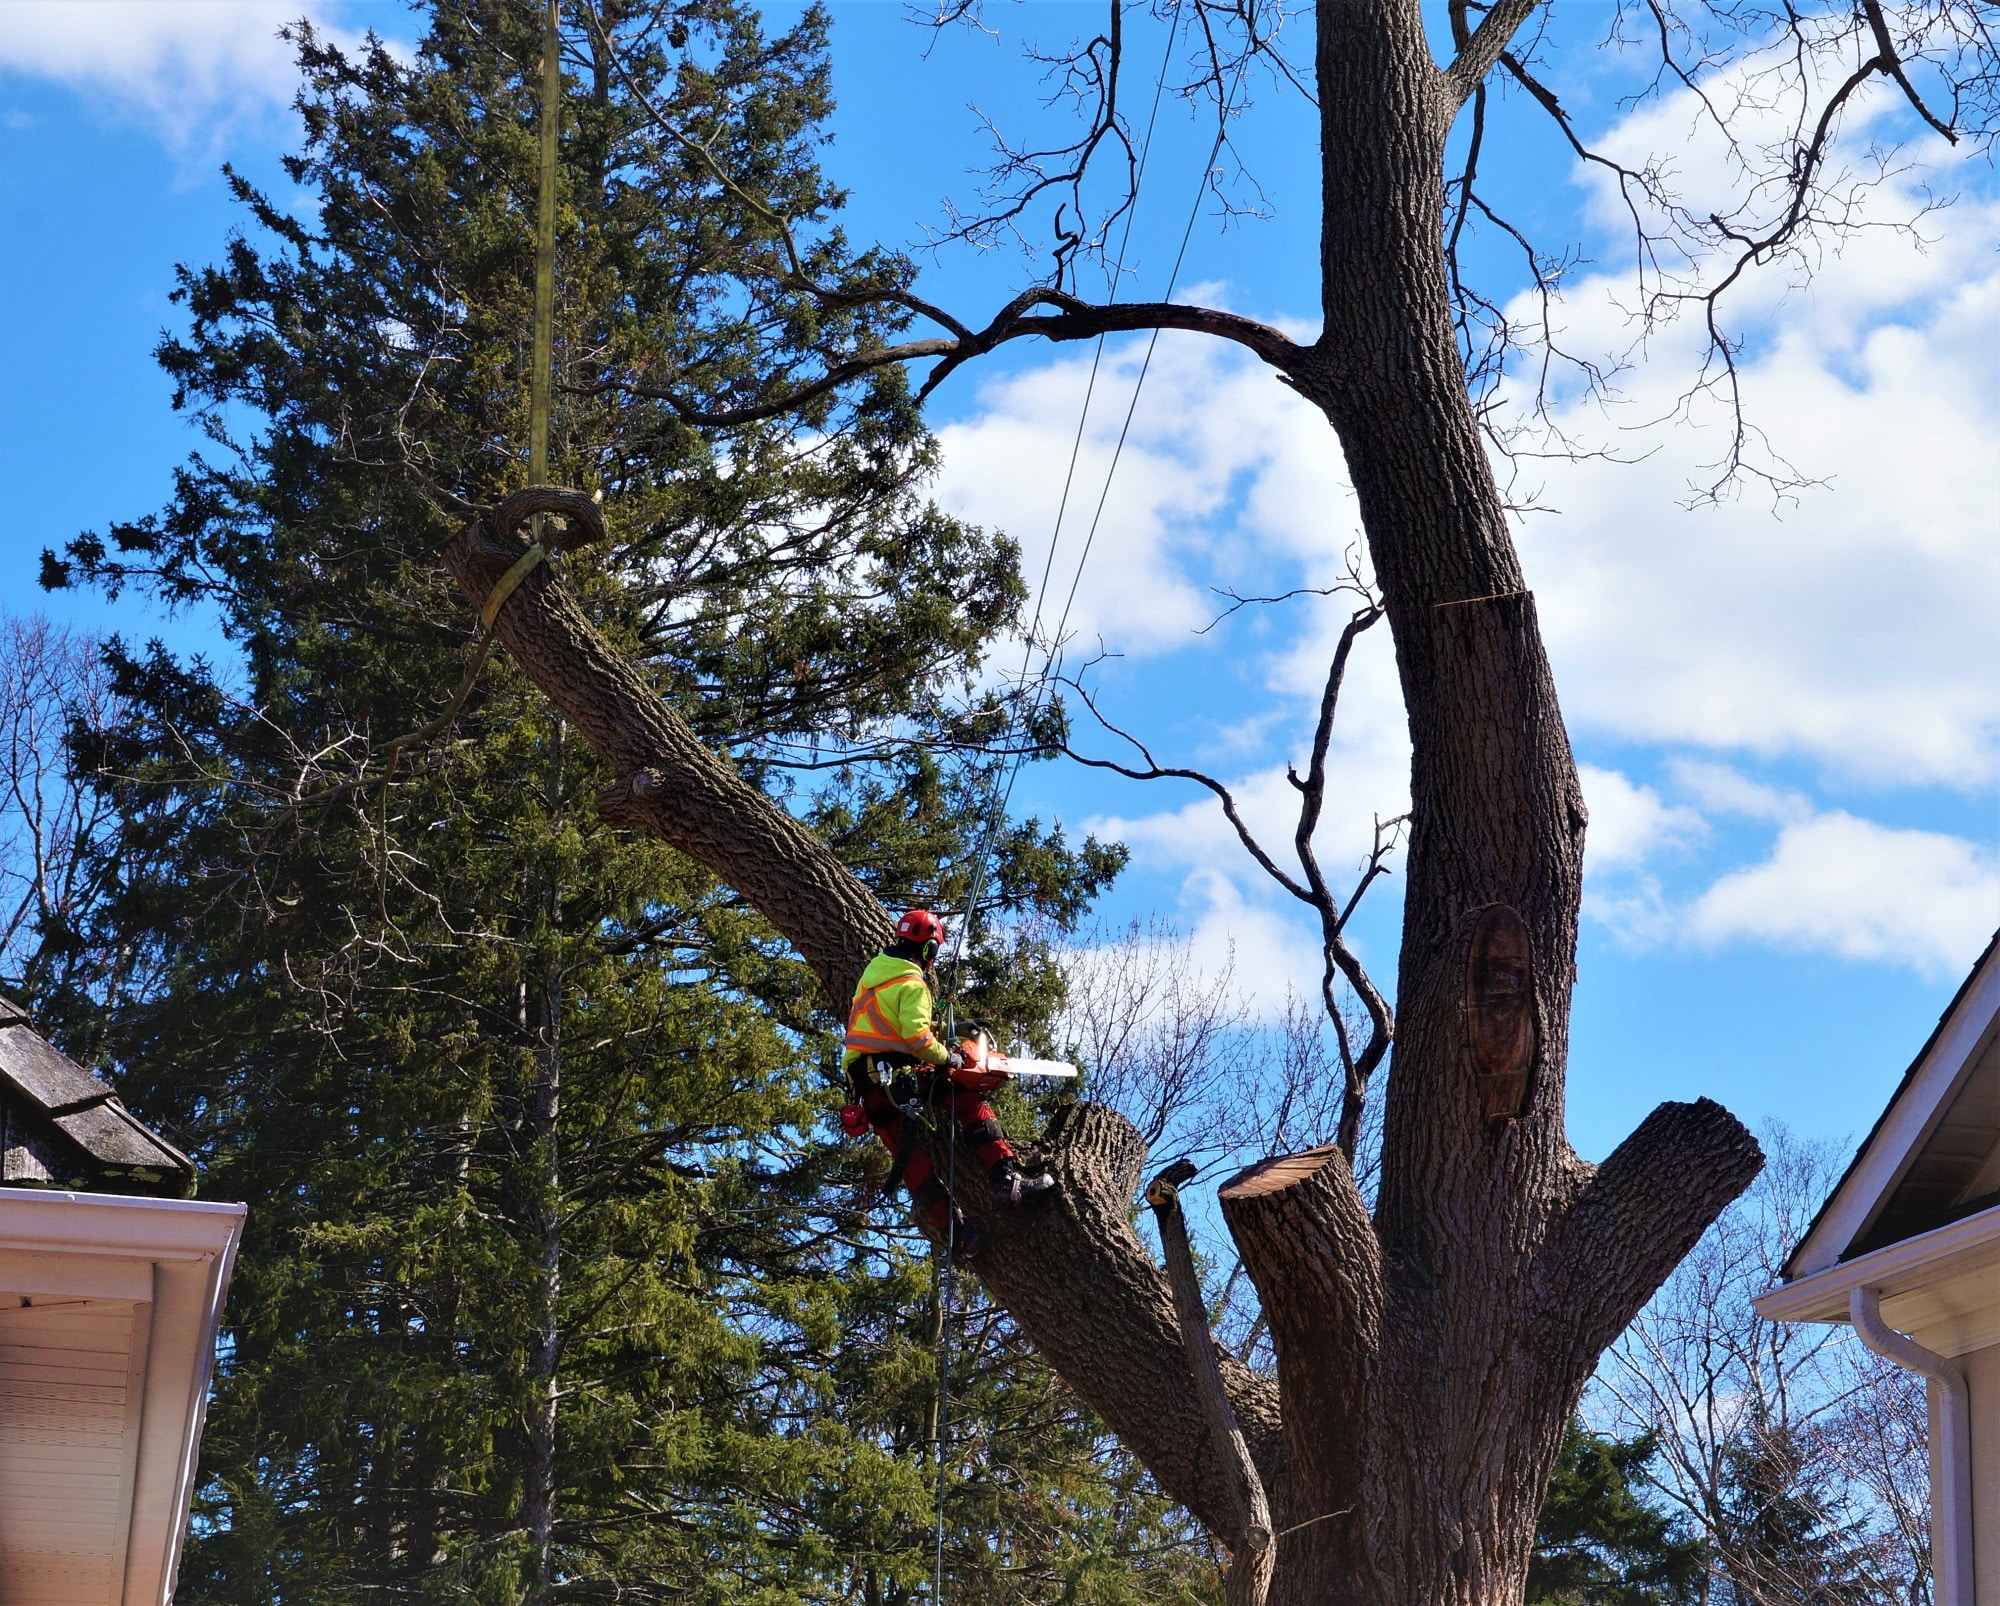 tree-removal-company-Brampton